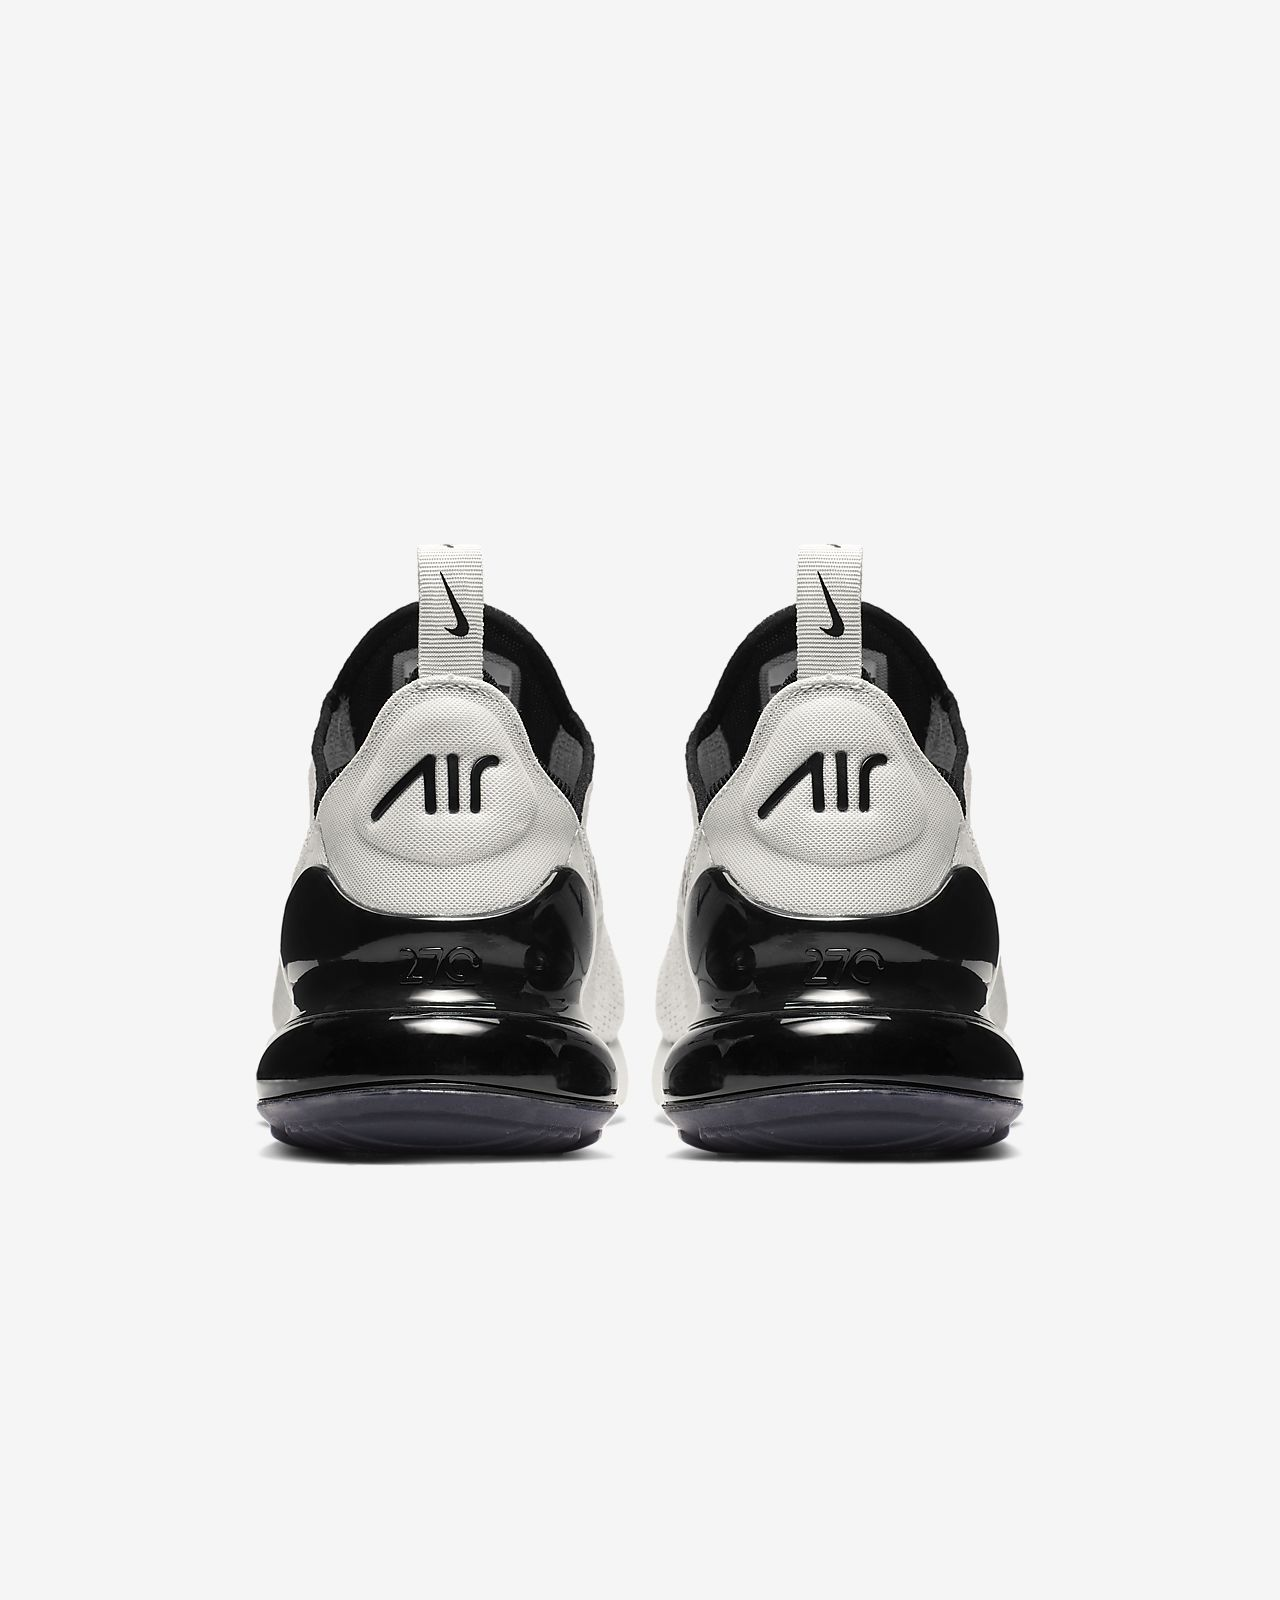 innovative design 3f2ab 1b3f2 ... Chaussure Nike Air Max 270 pour Femme